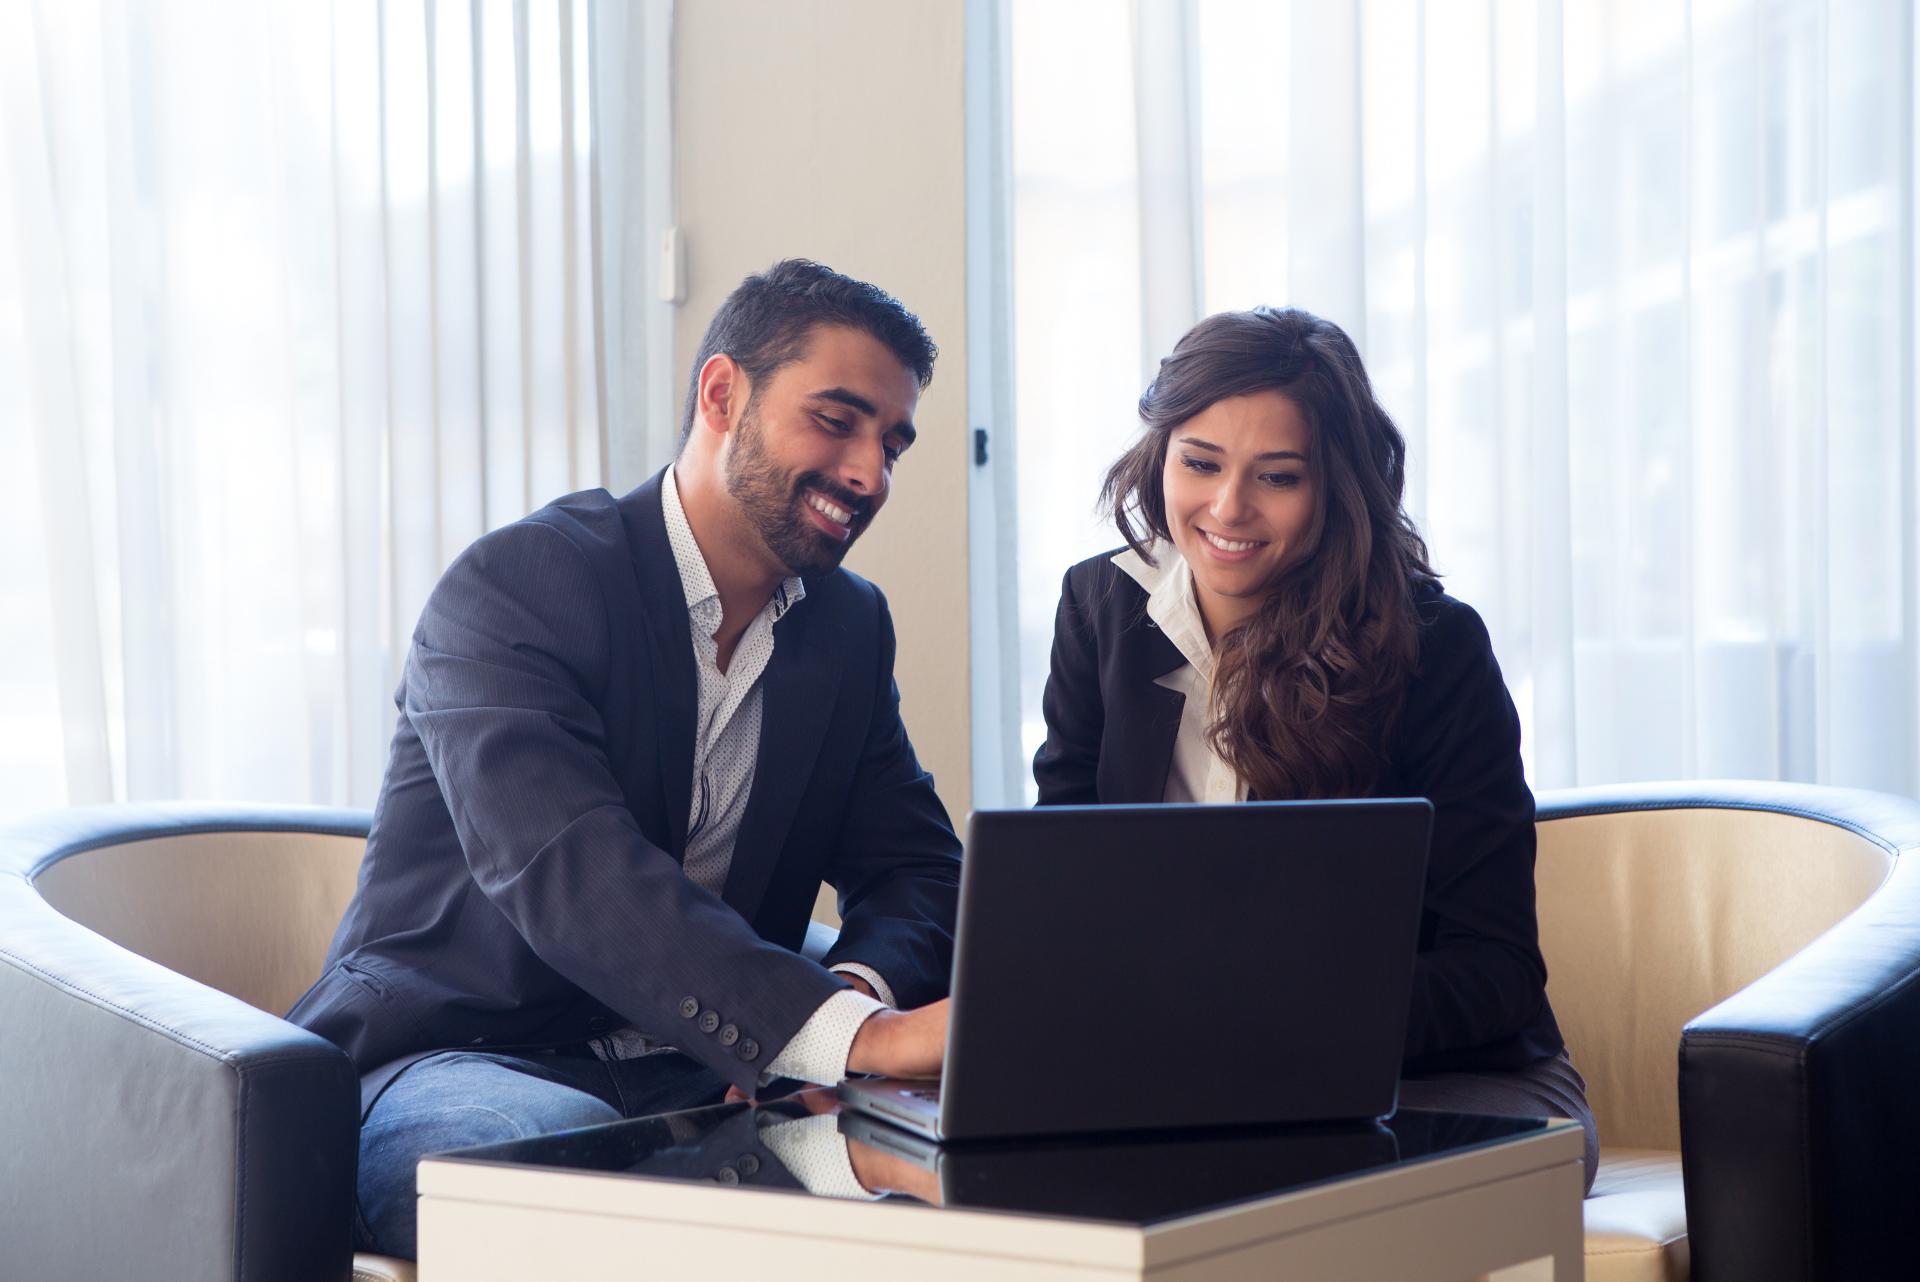 customer surveys data analysis